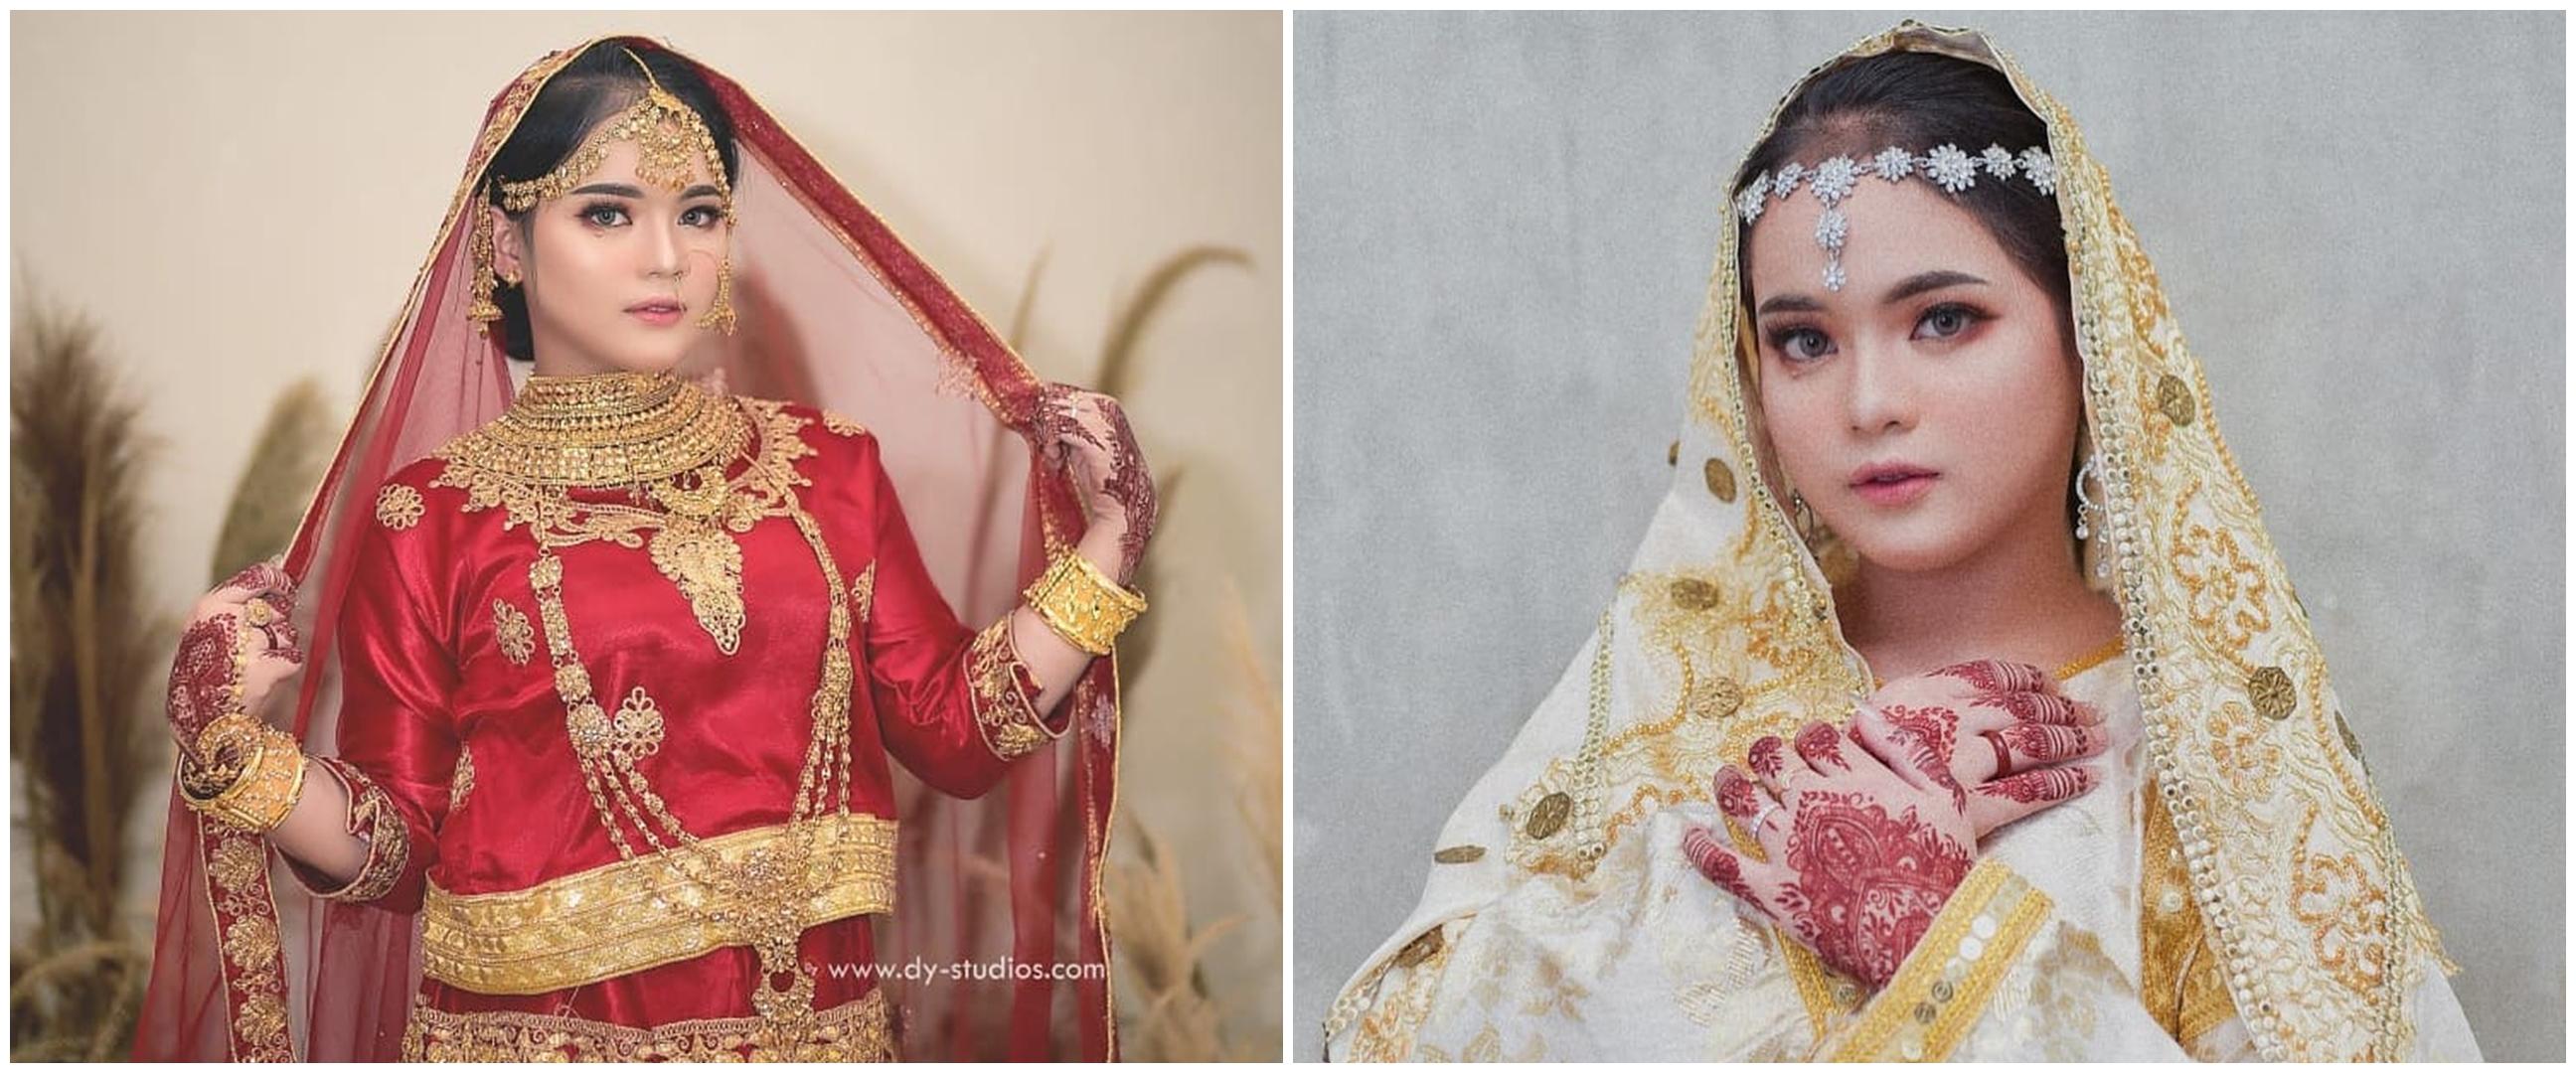 10 Pemotretan Putri D'Academy pakai kain sari, bak seleb Bollywood